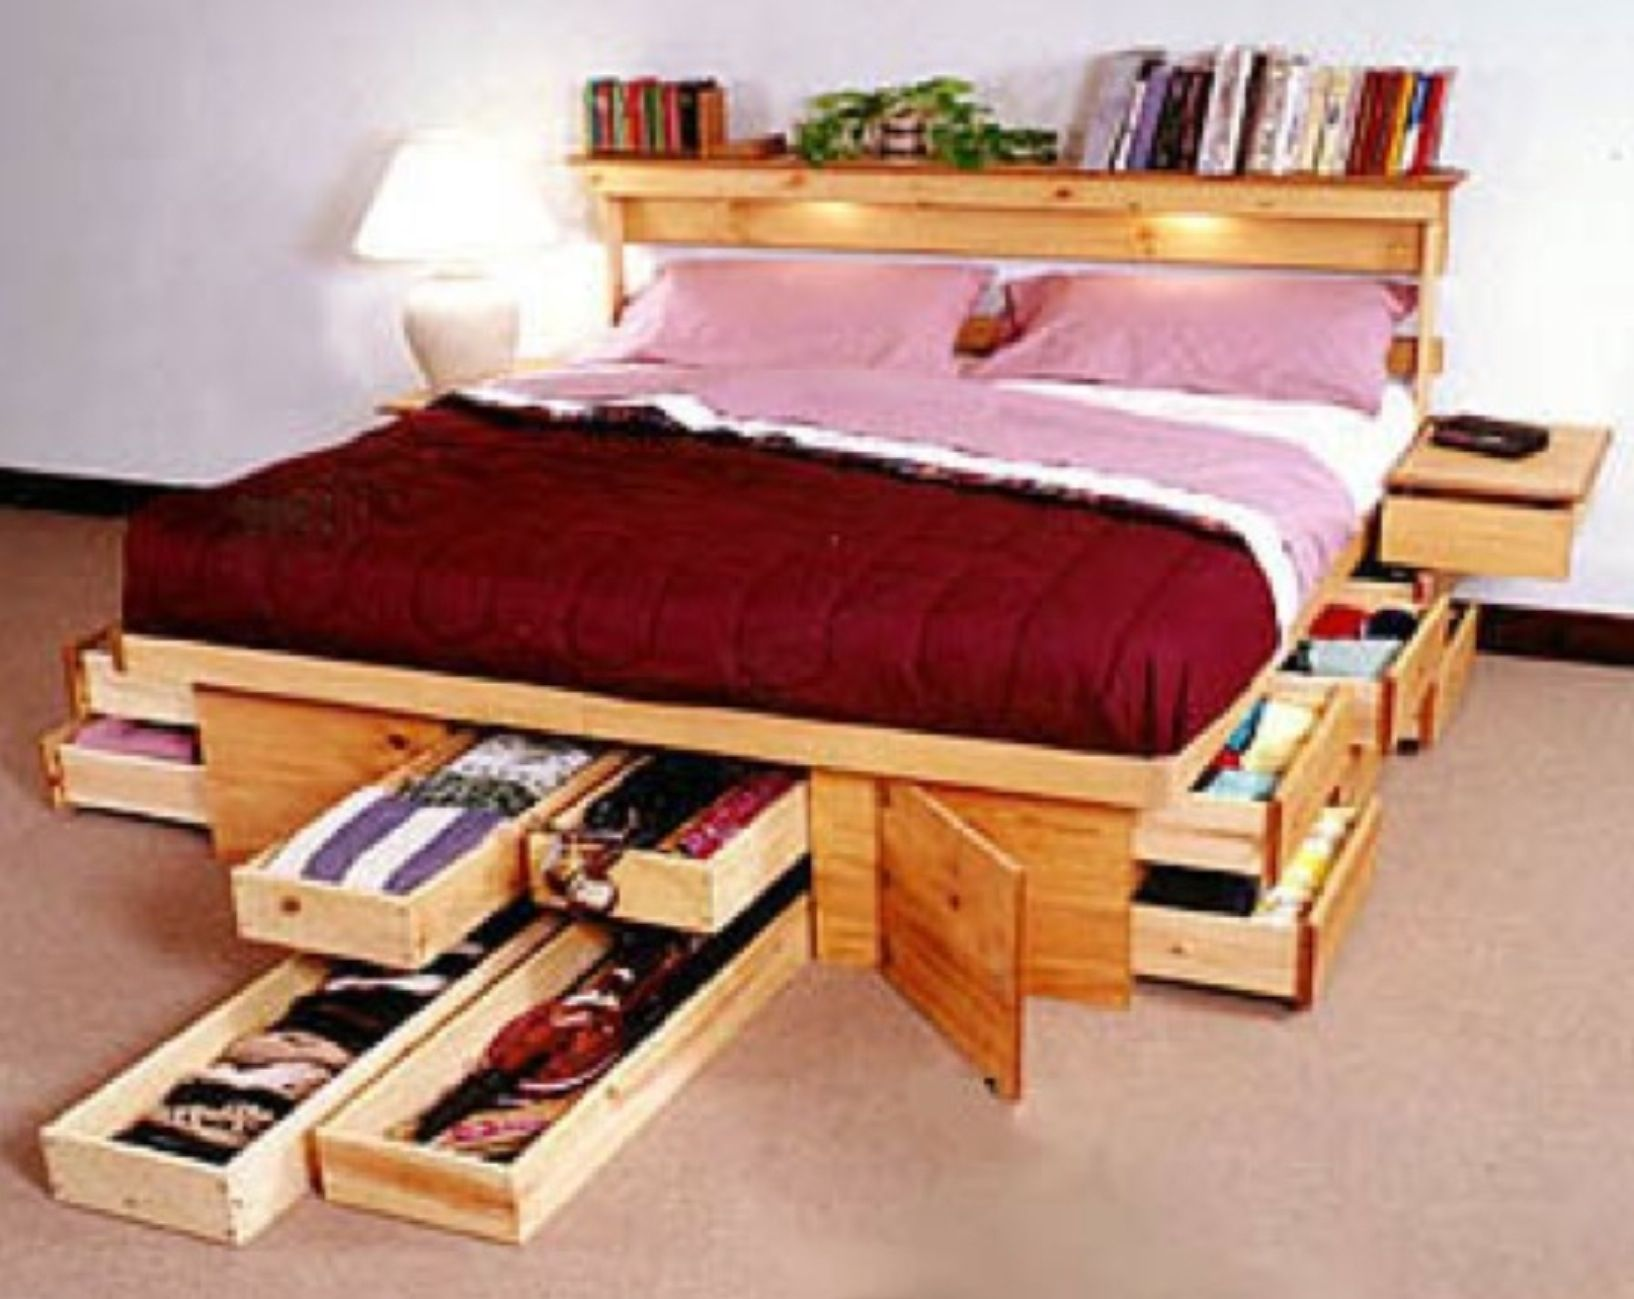 Under mattress storage   Projects for little ones   Pinterest ...